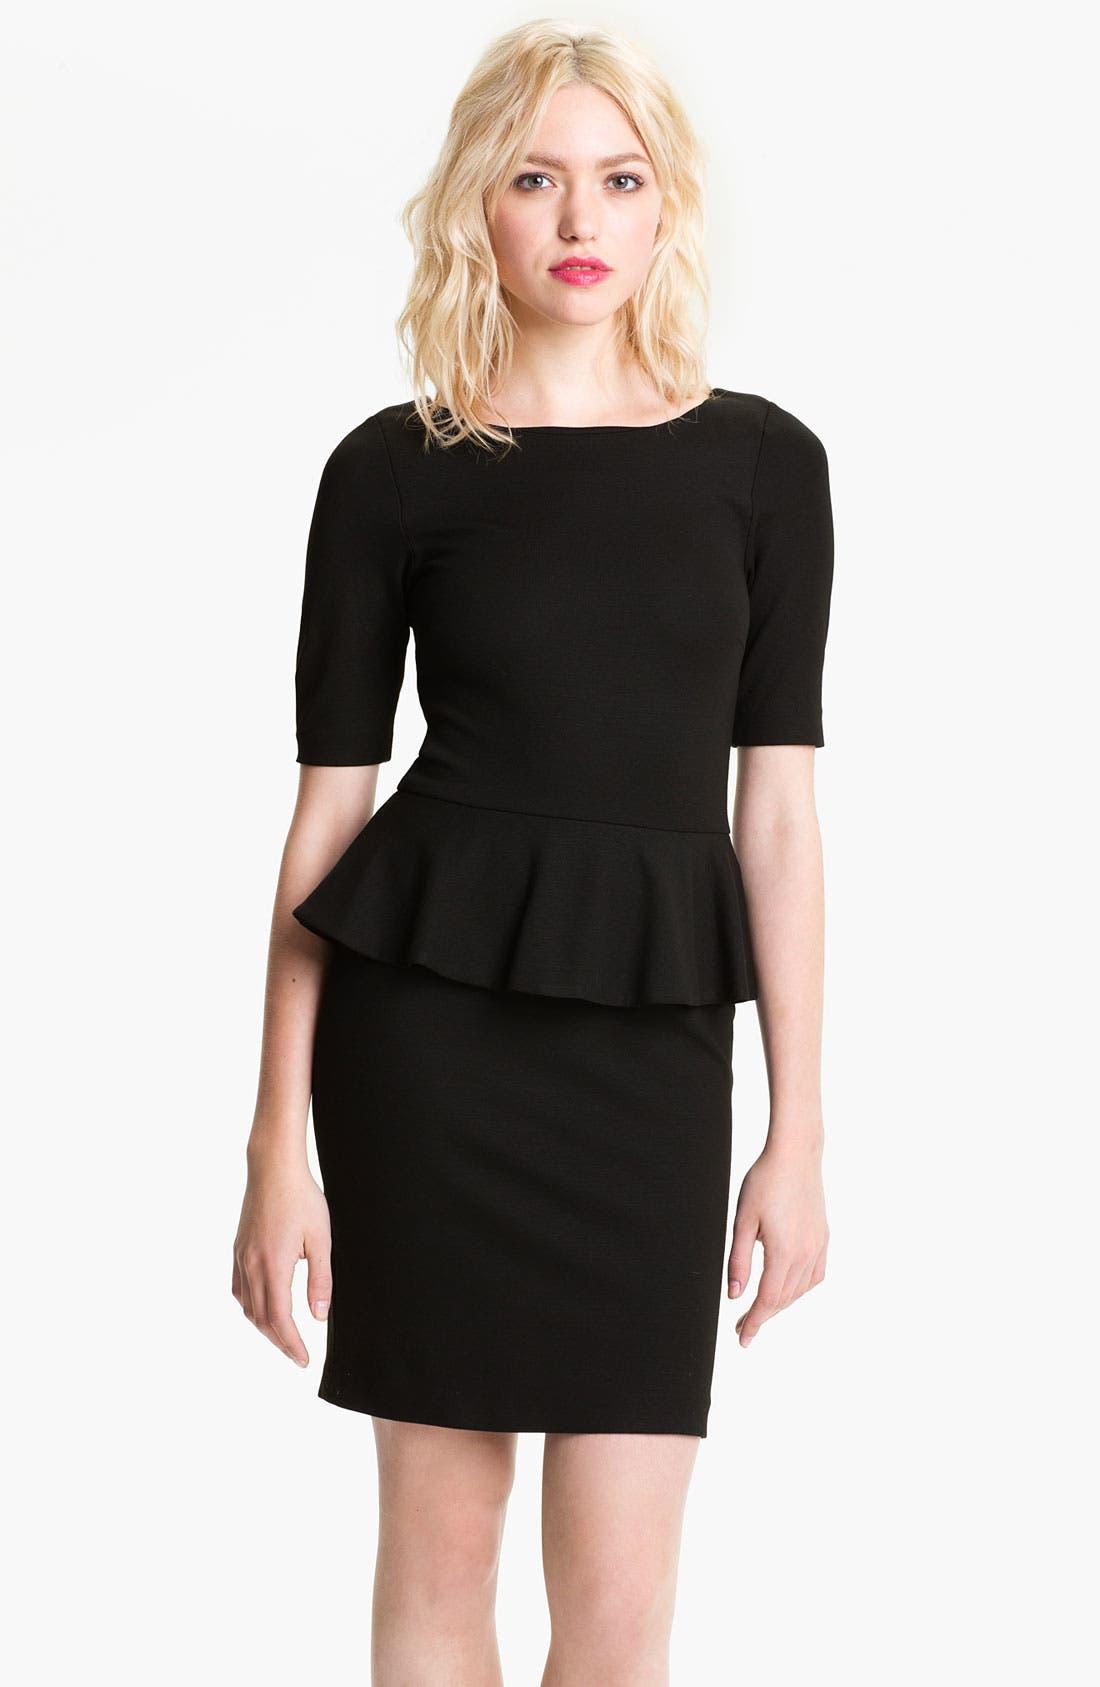 Alternate Image 1 Selected - Ella Moss 'Emily' Peplum Dress